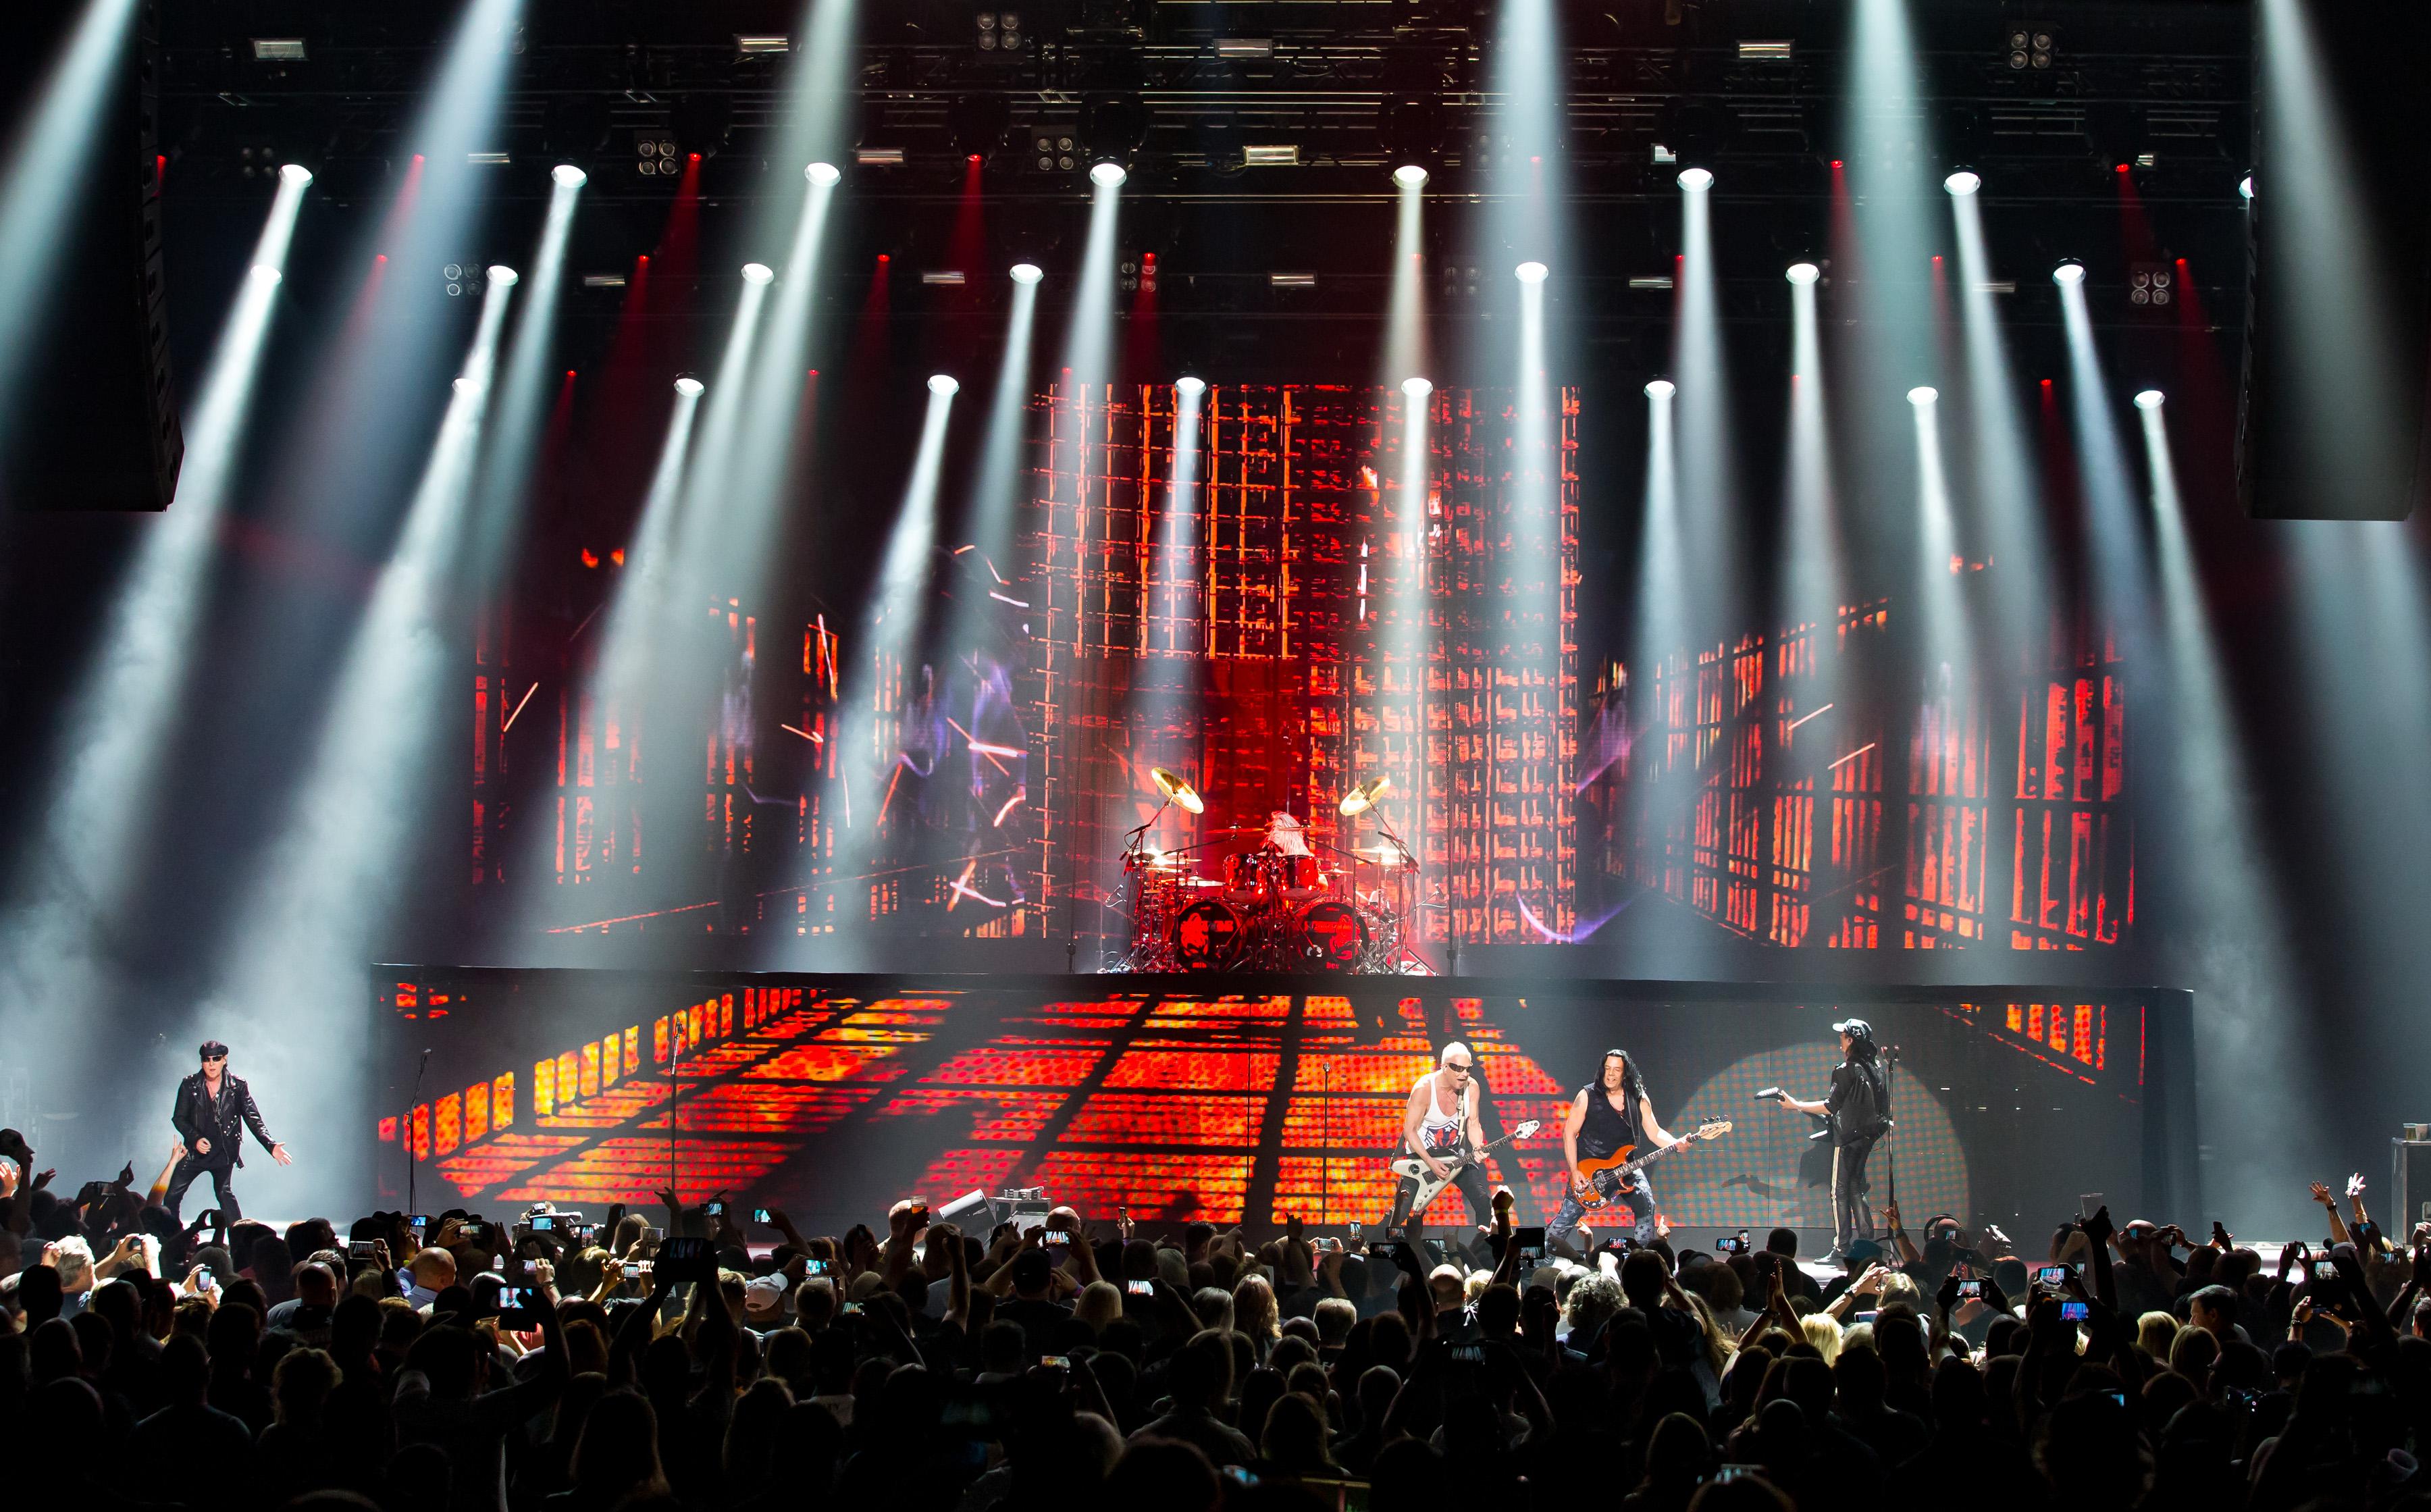 Scorpions taking the stage at The Joint photo credit: © Erik Kabik/Kabik Photo Group